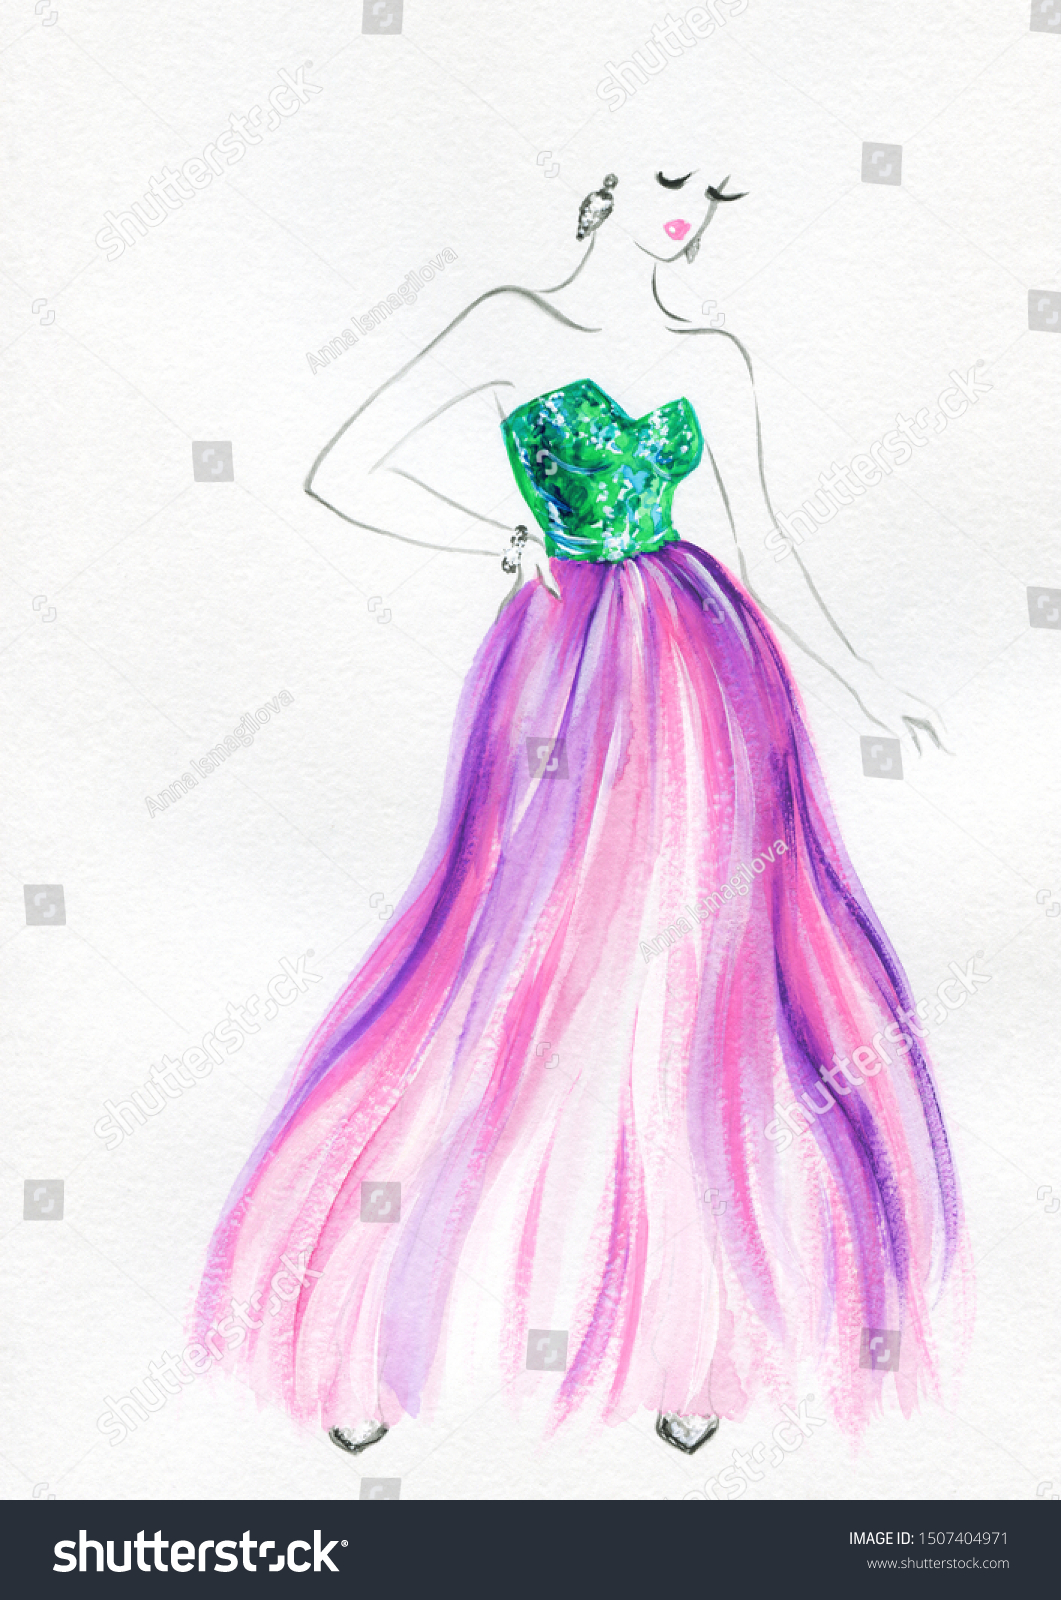 Fashion Illustration Watercolor Painting Fashion Designer Stock Illustration 1507404971